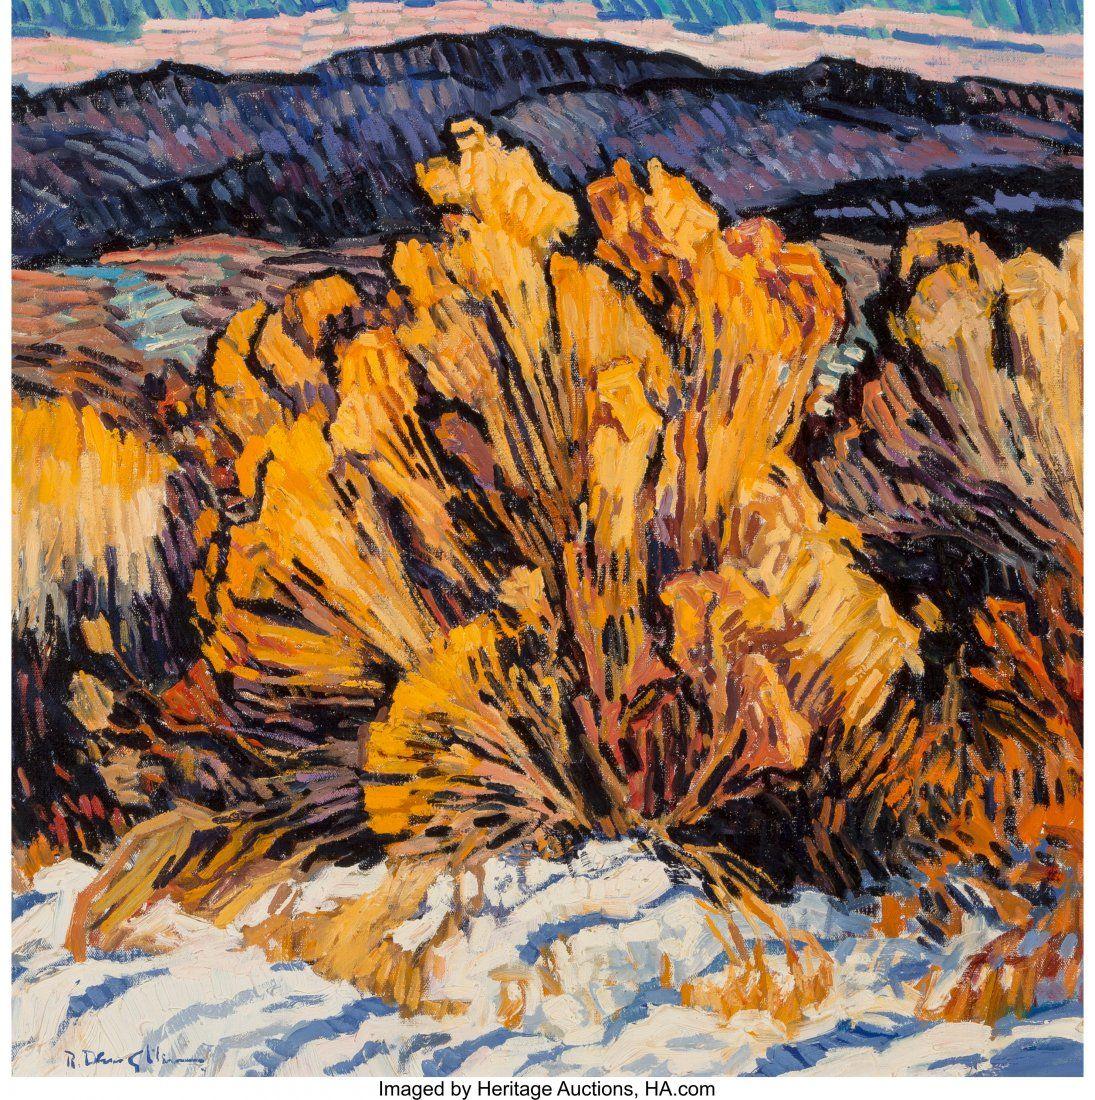 Robert Daughters (American, b. 1929) First Snow